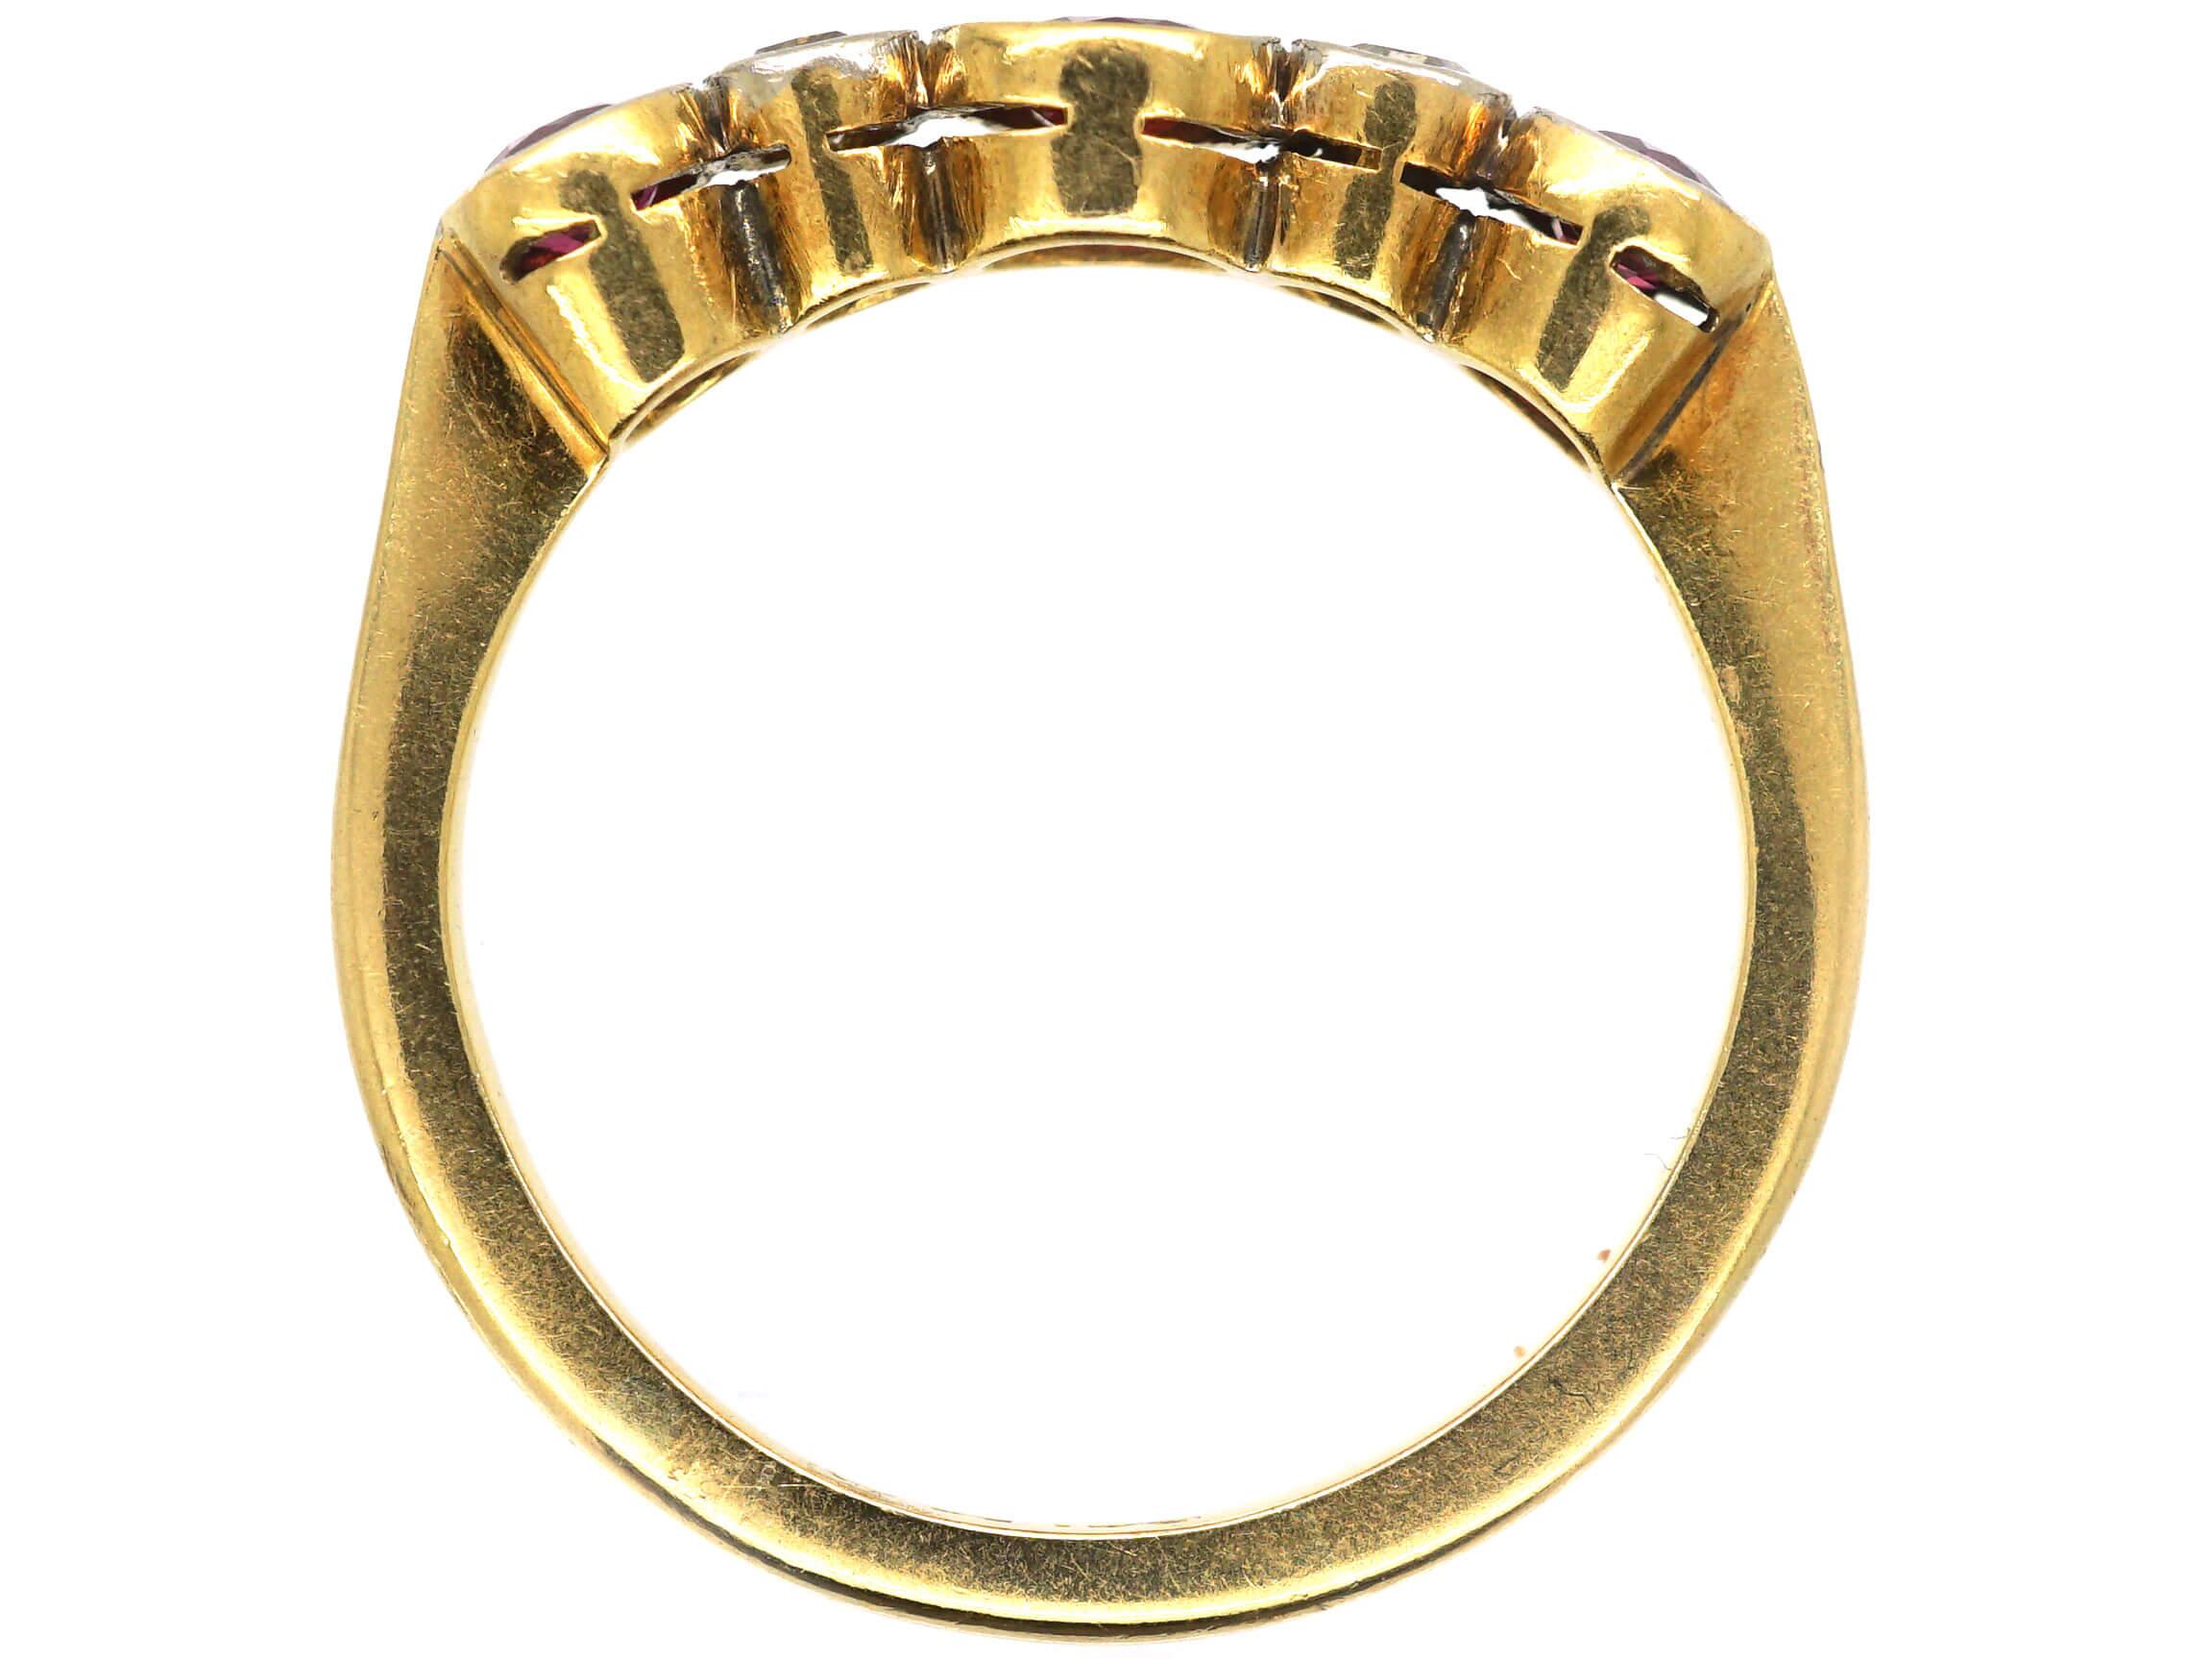 Edwardian 18ct Gold & Platinum Five Stone Ruby & Diamond Ring